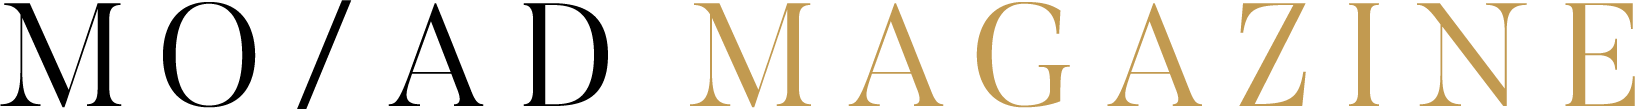 MO/AD Magazine